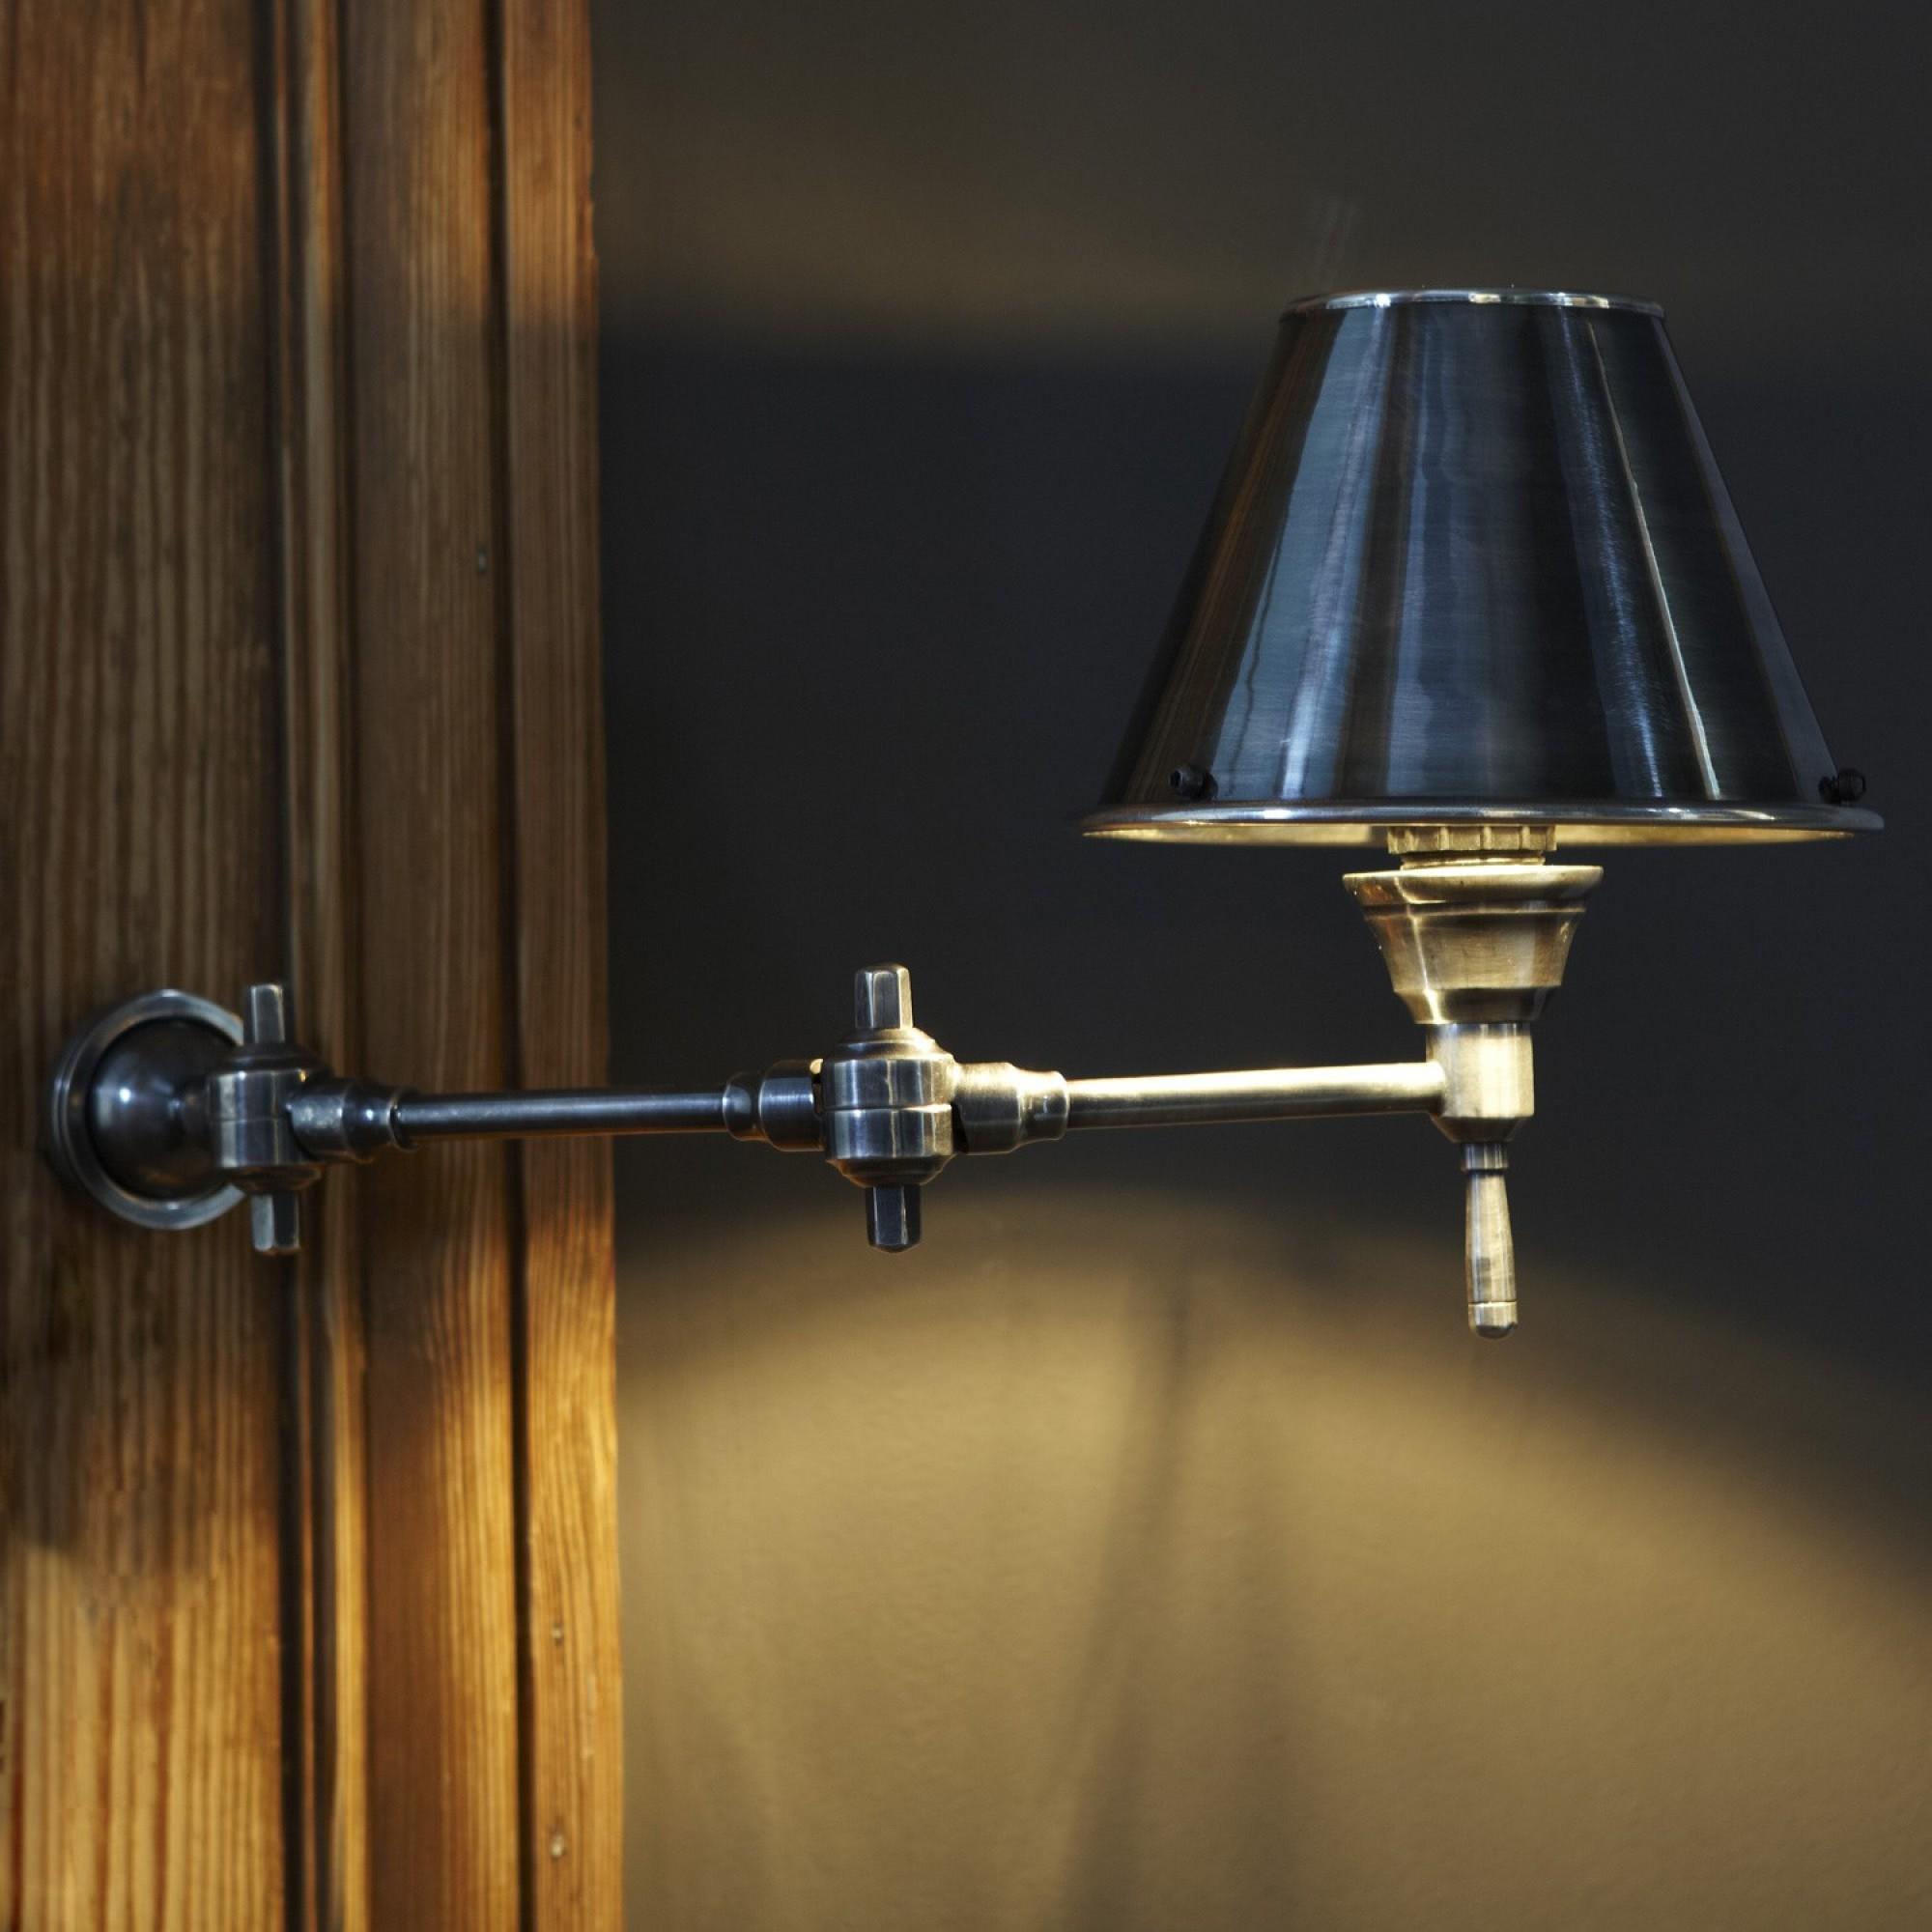 Lampen Online Wandlampe Im Fabrik Design Antik Messing: LOBERON. Coming Home